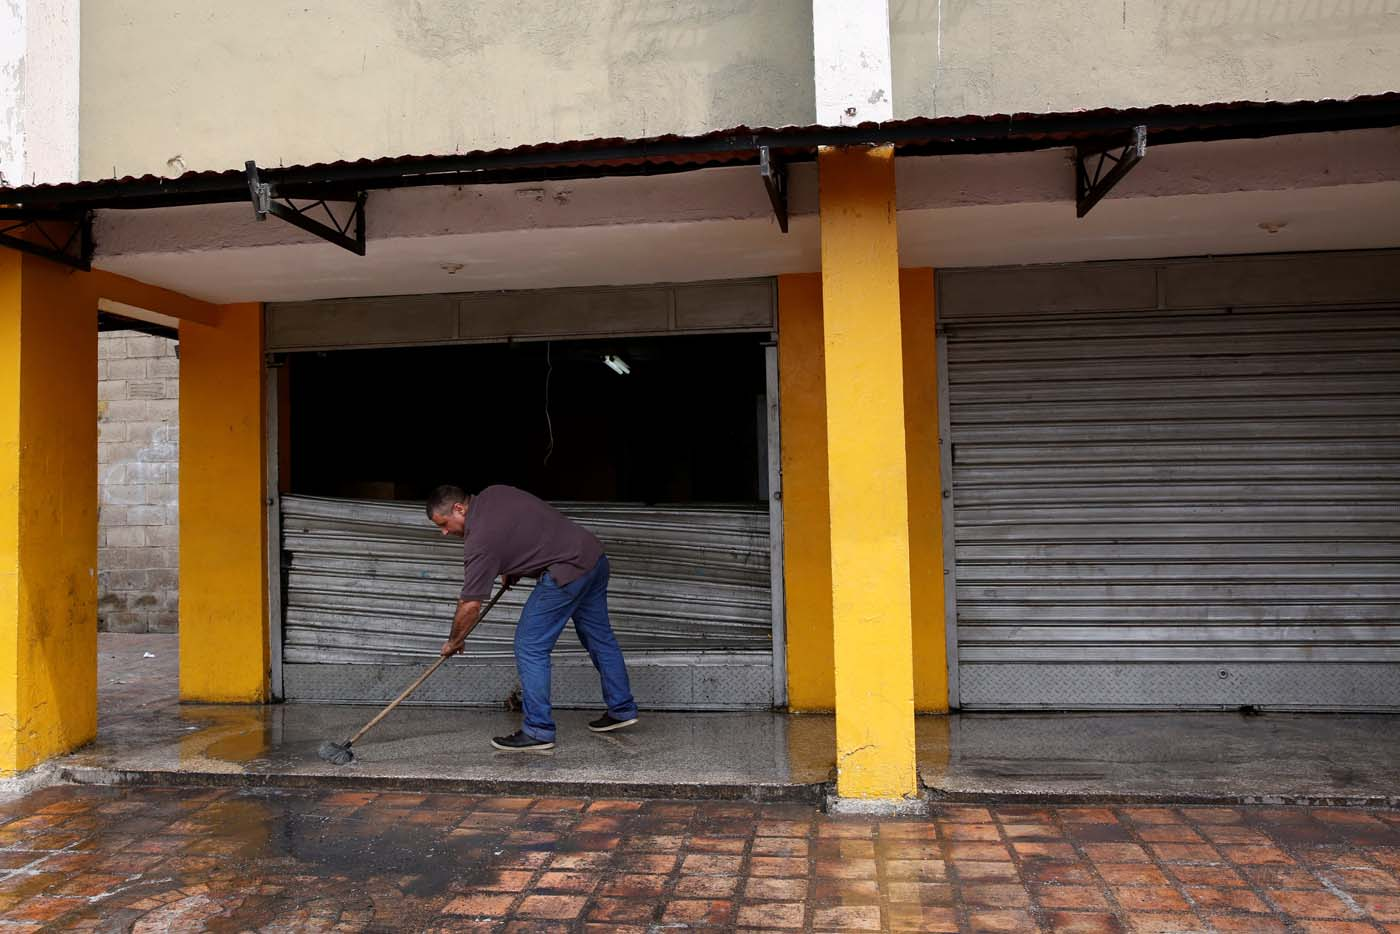 A man cleans the floor next to the broken door of a supermarket which was looted in Caracas, Venezuela April 21, 2017. REUTERS/Carlos Garcia Rawlins